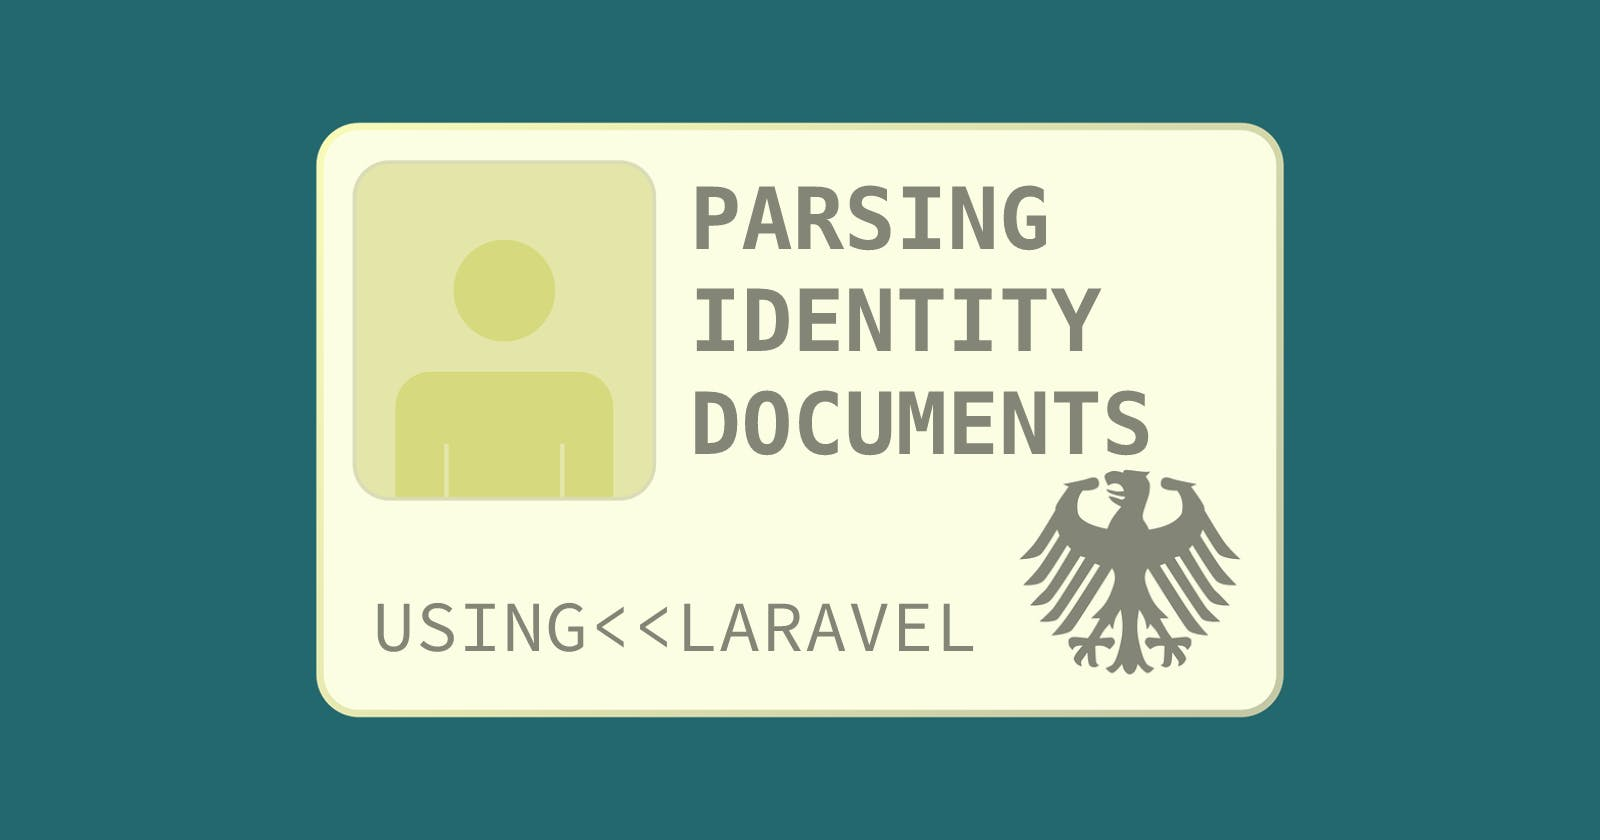 Processing Identity Documents in Laravel